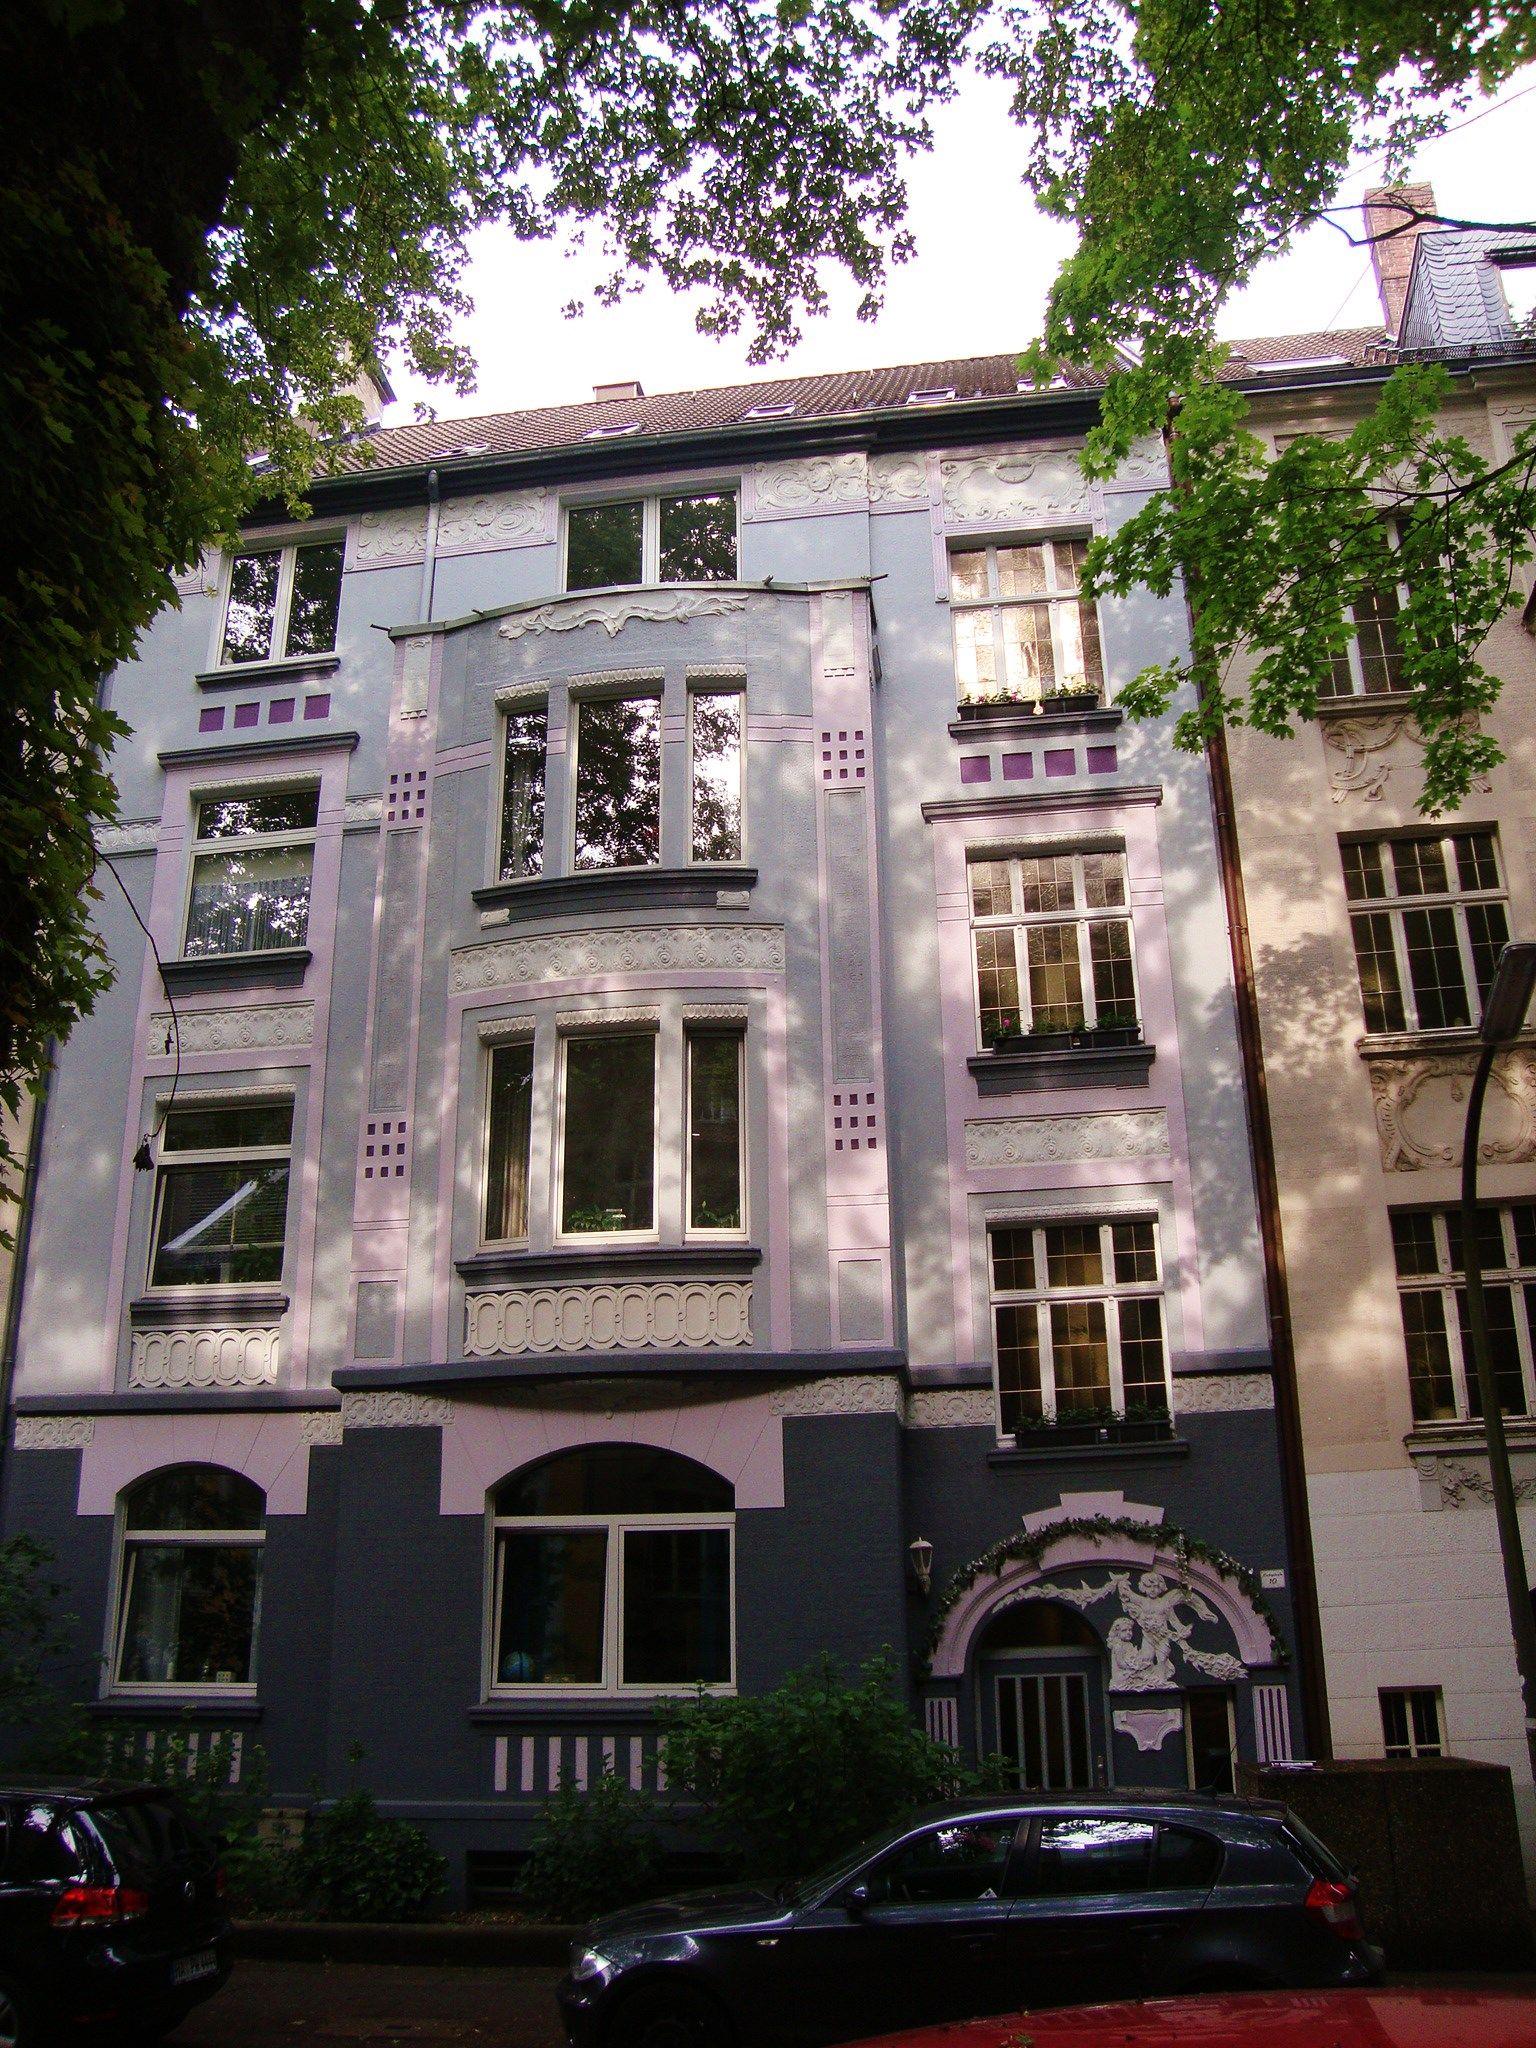 In House Dortmund house at liebigstr dortmund germany дом на улице либиха дортмунд